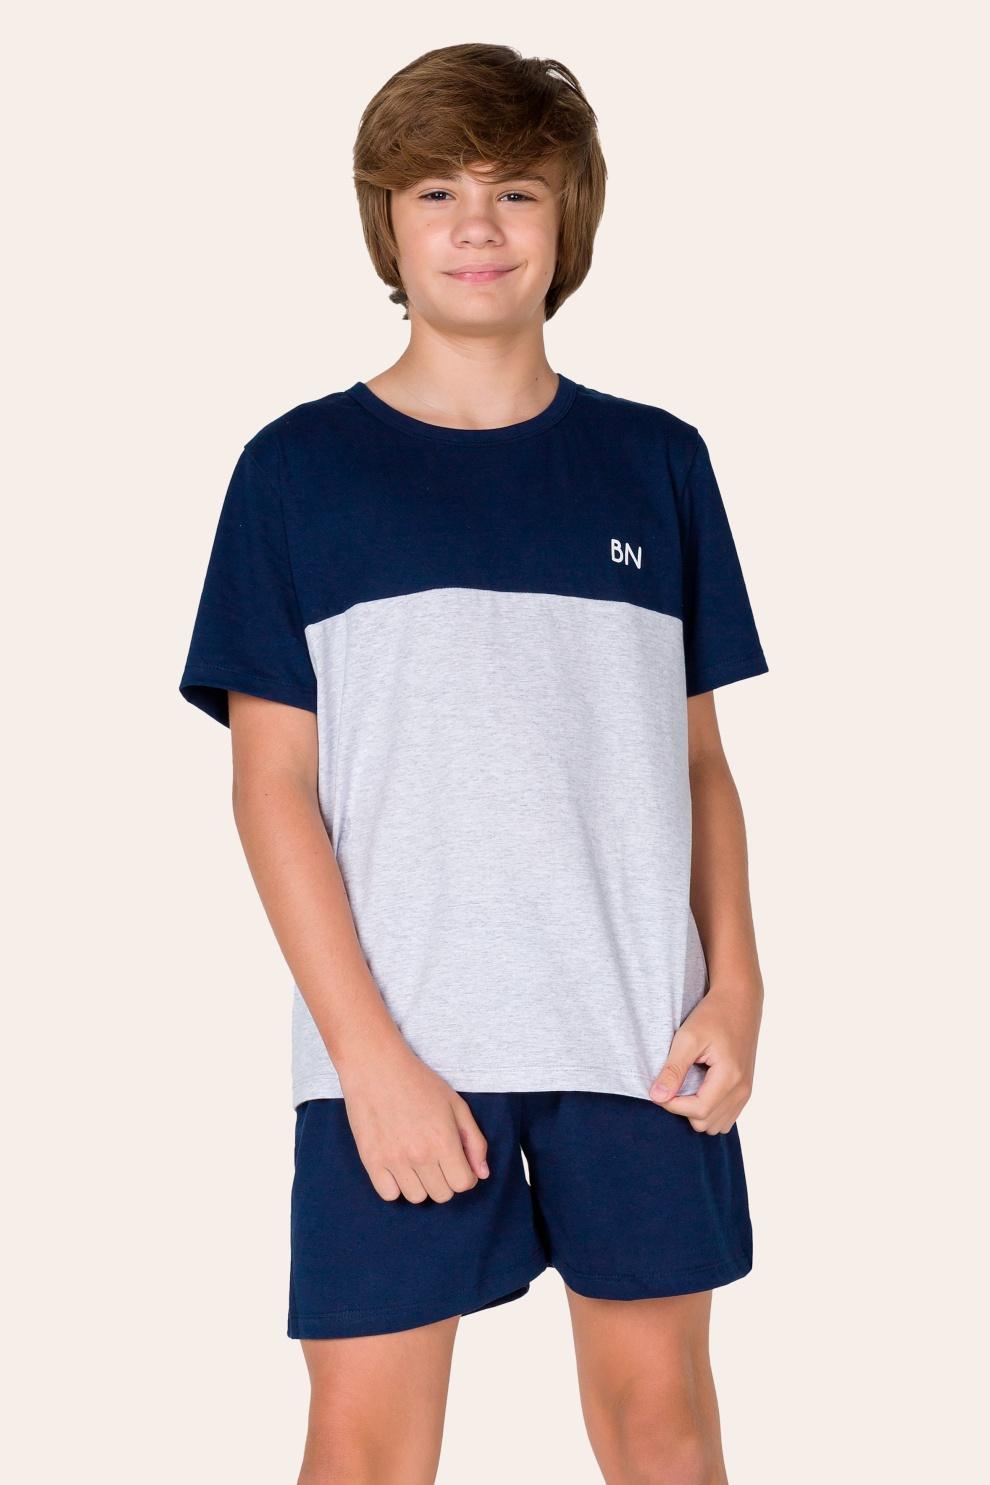 035/B - Pijama Juvenil Masculino com Recorte